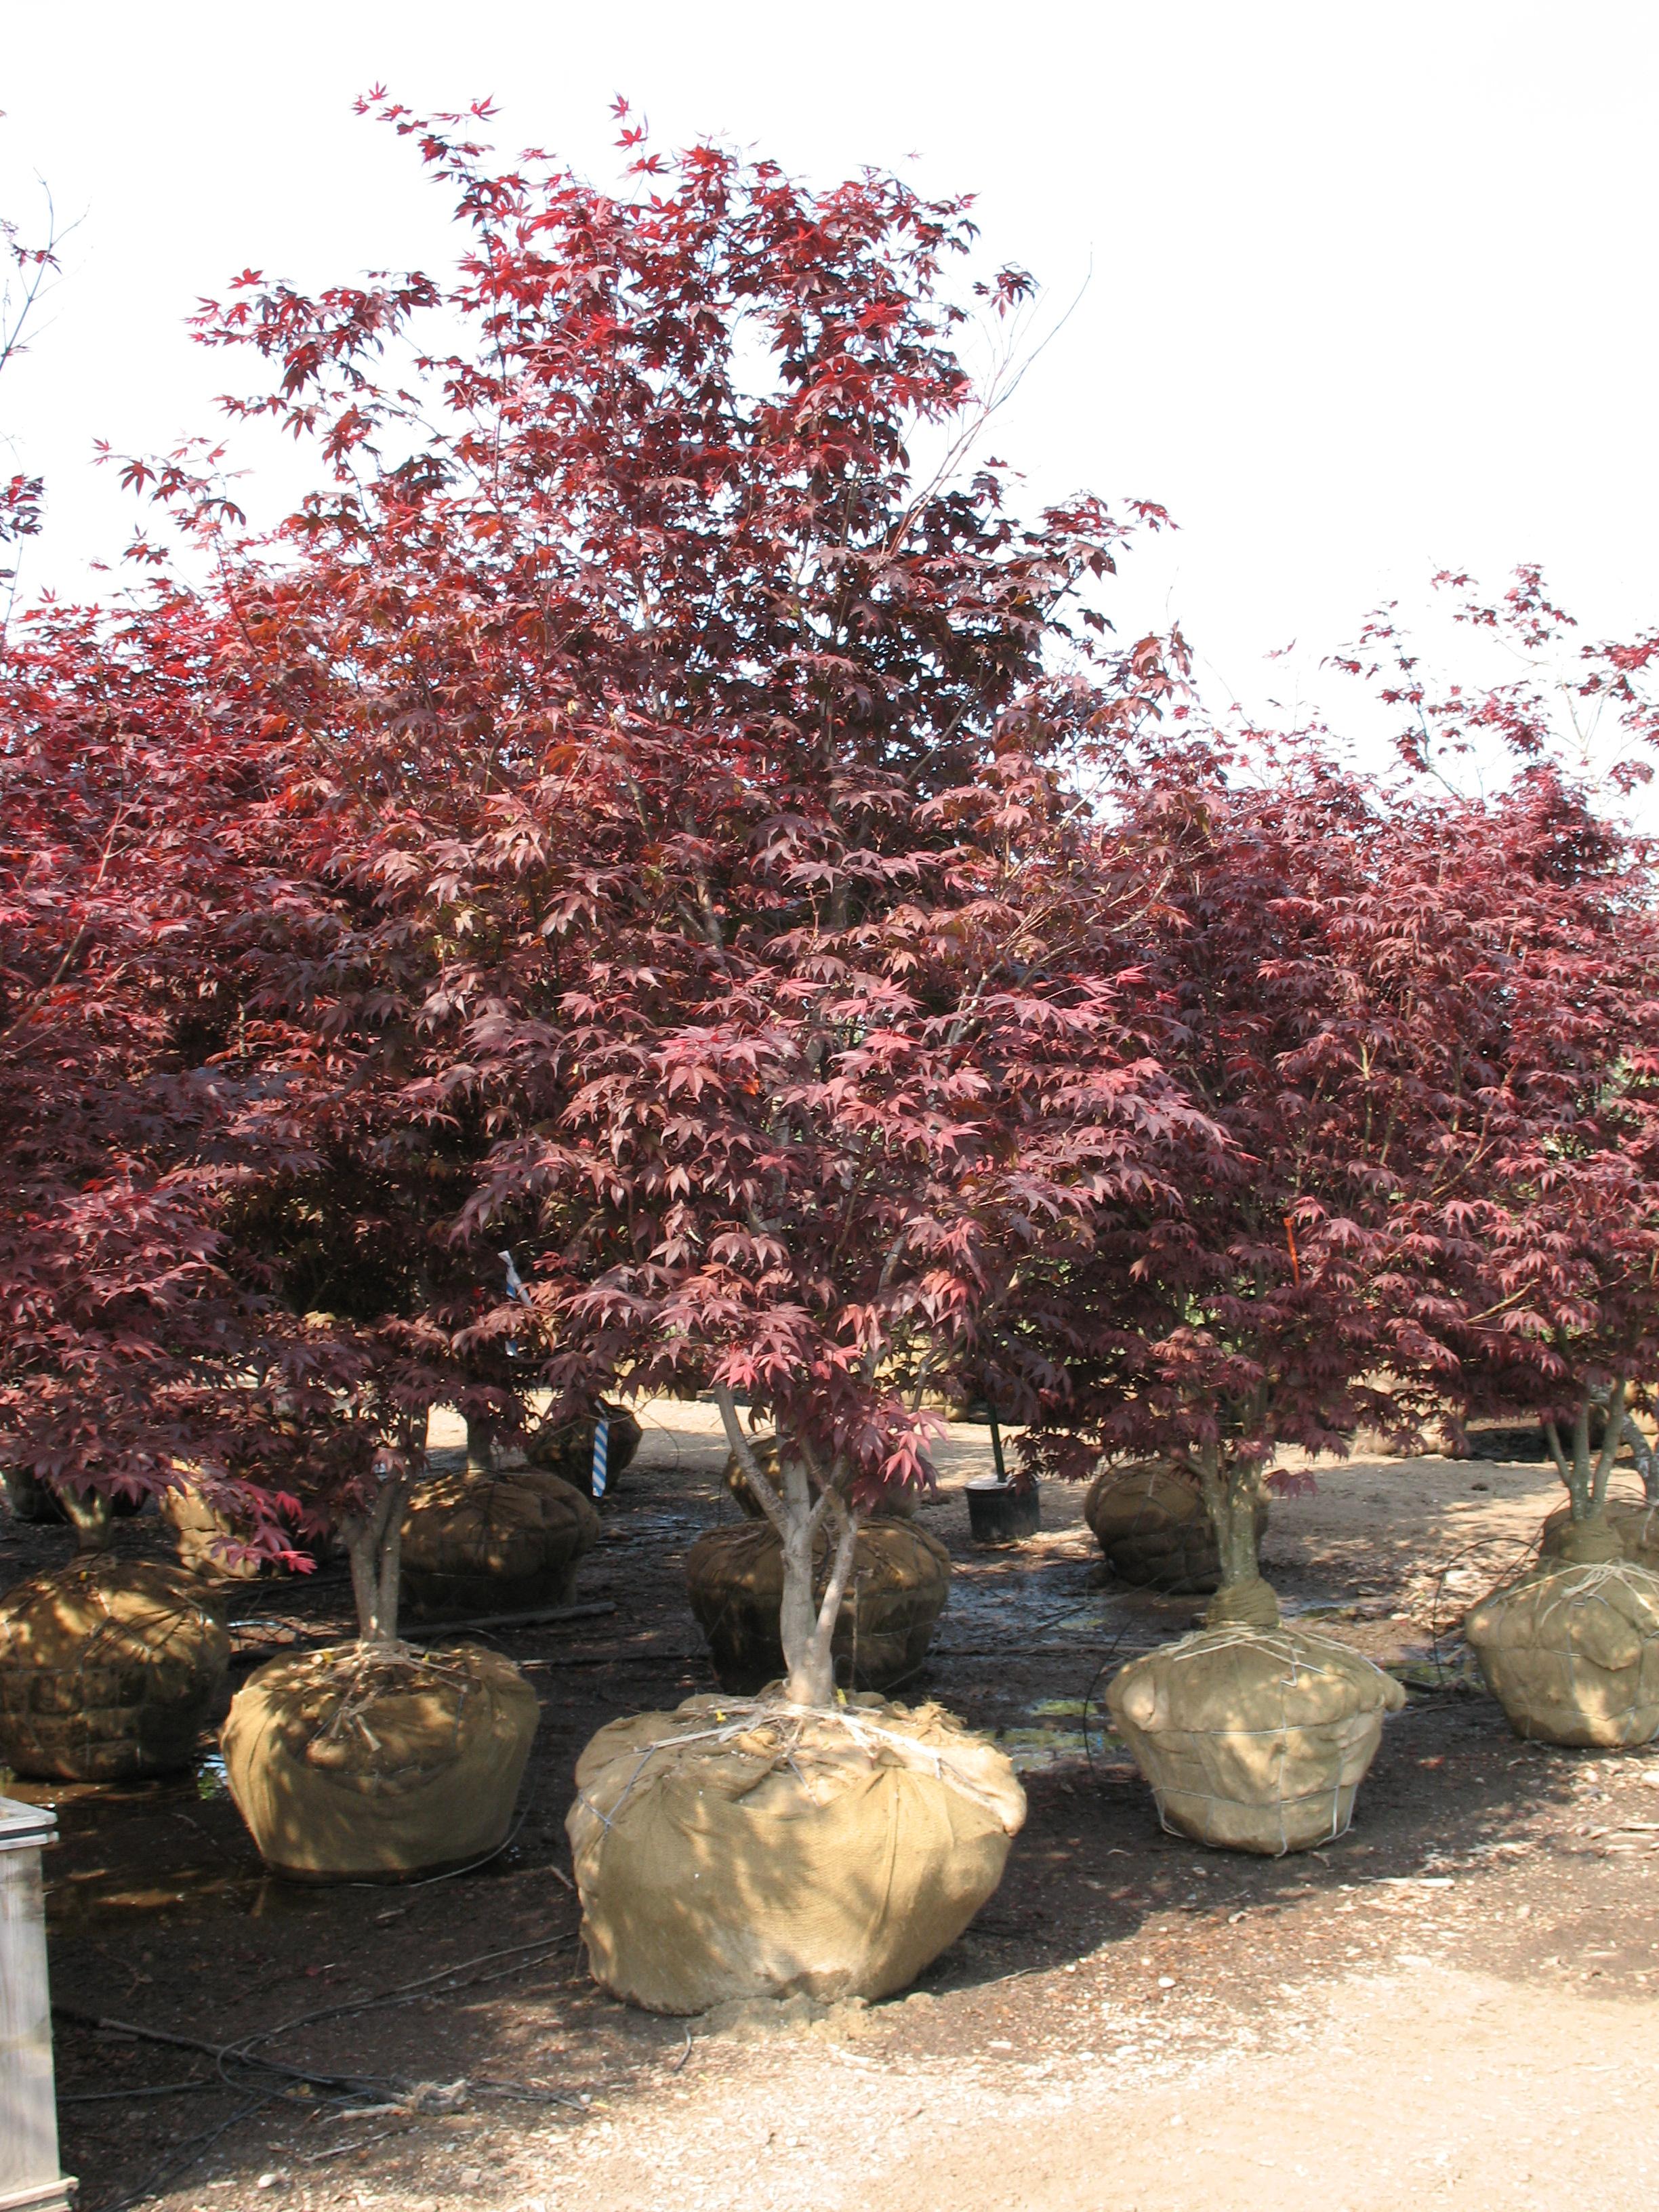 Landscapehub Plant Information For Acer Palmatum Bloodgood